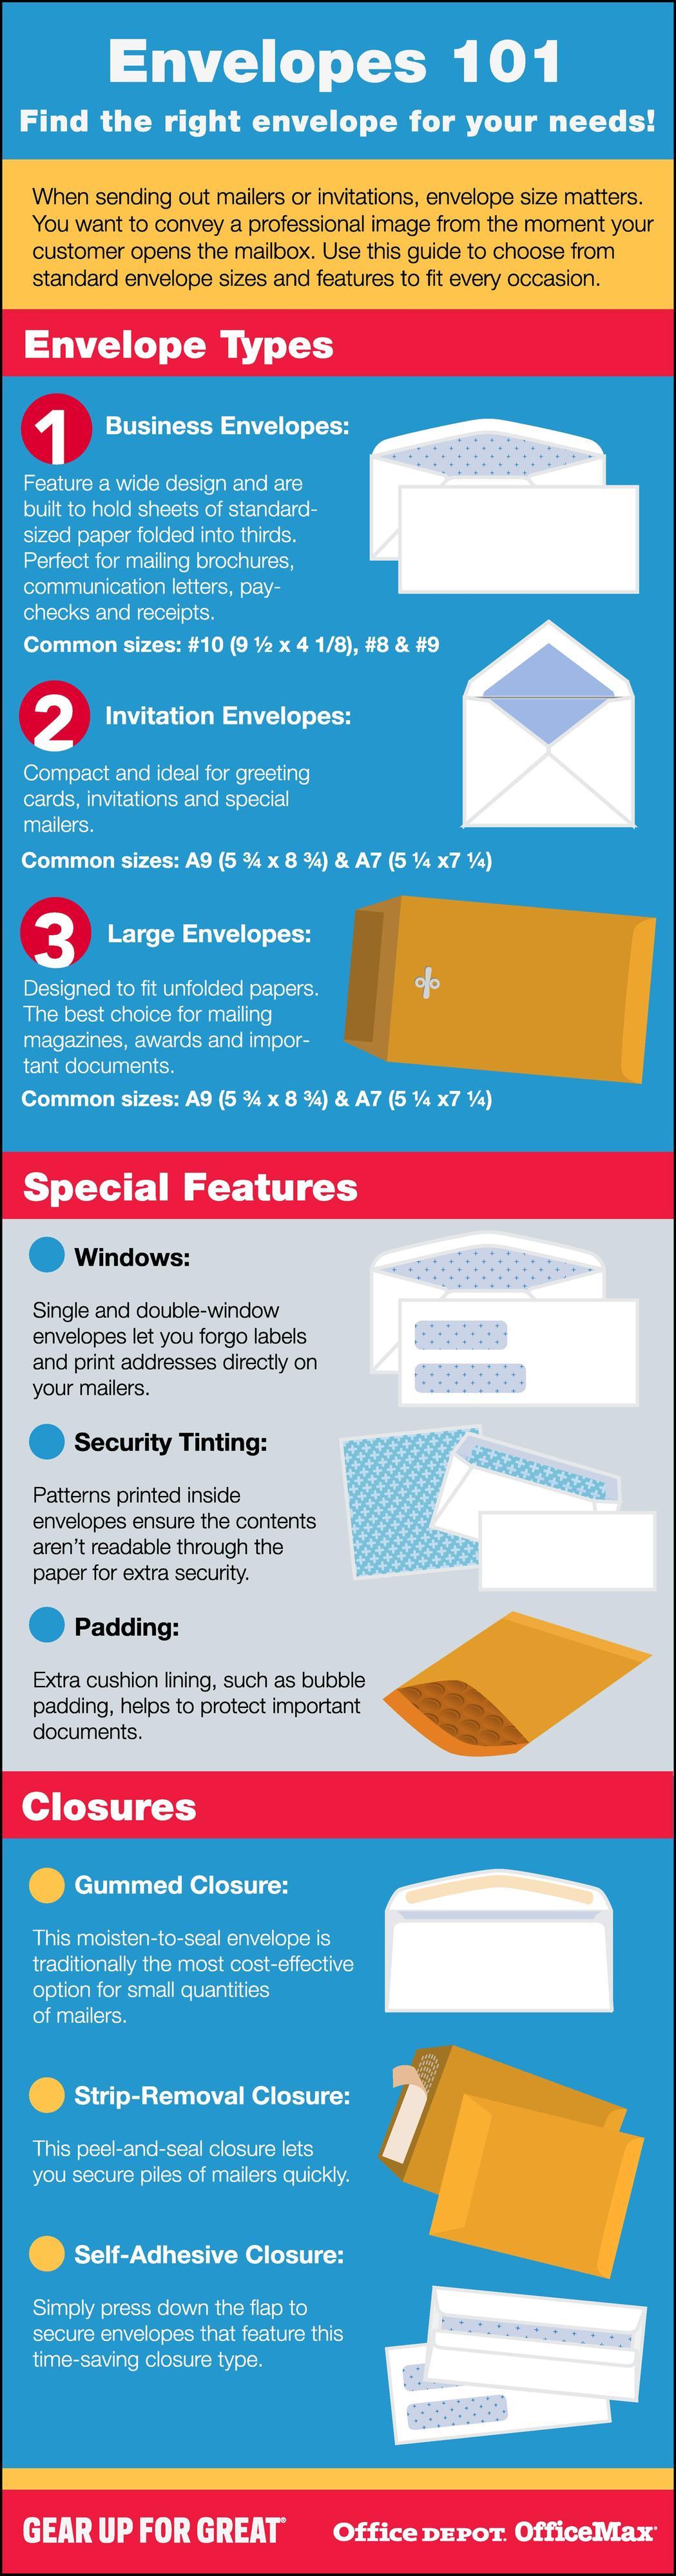 Final - Shipping Infographic - Envelopes 101 (Full)